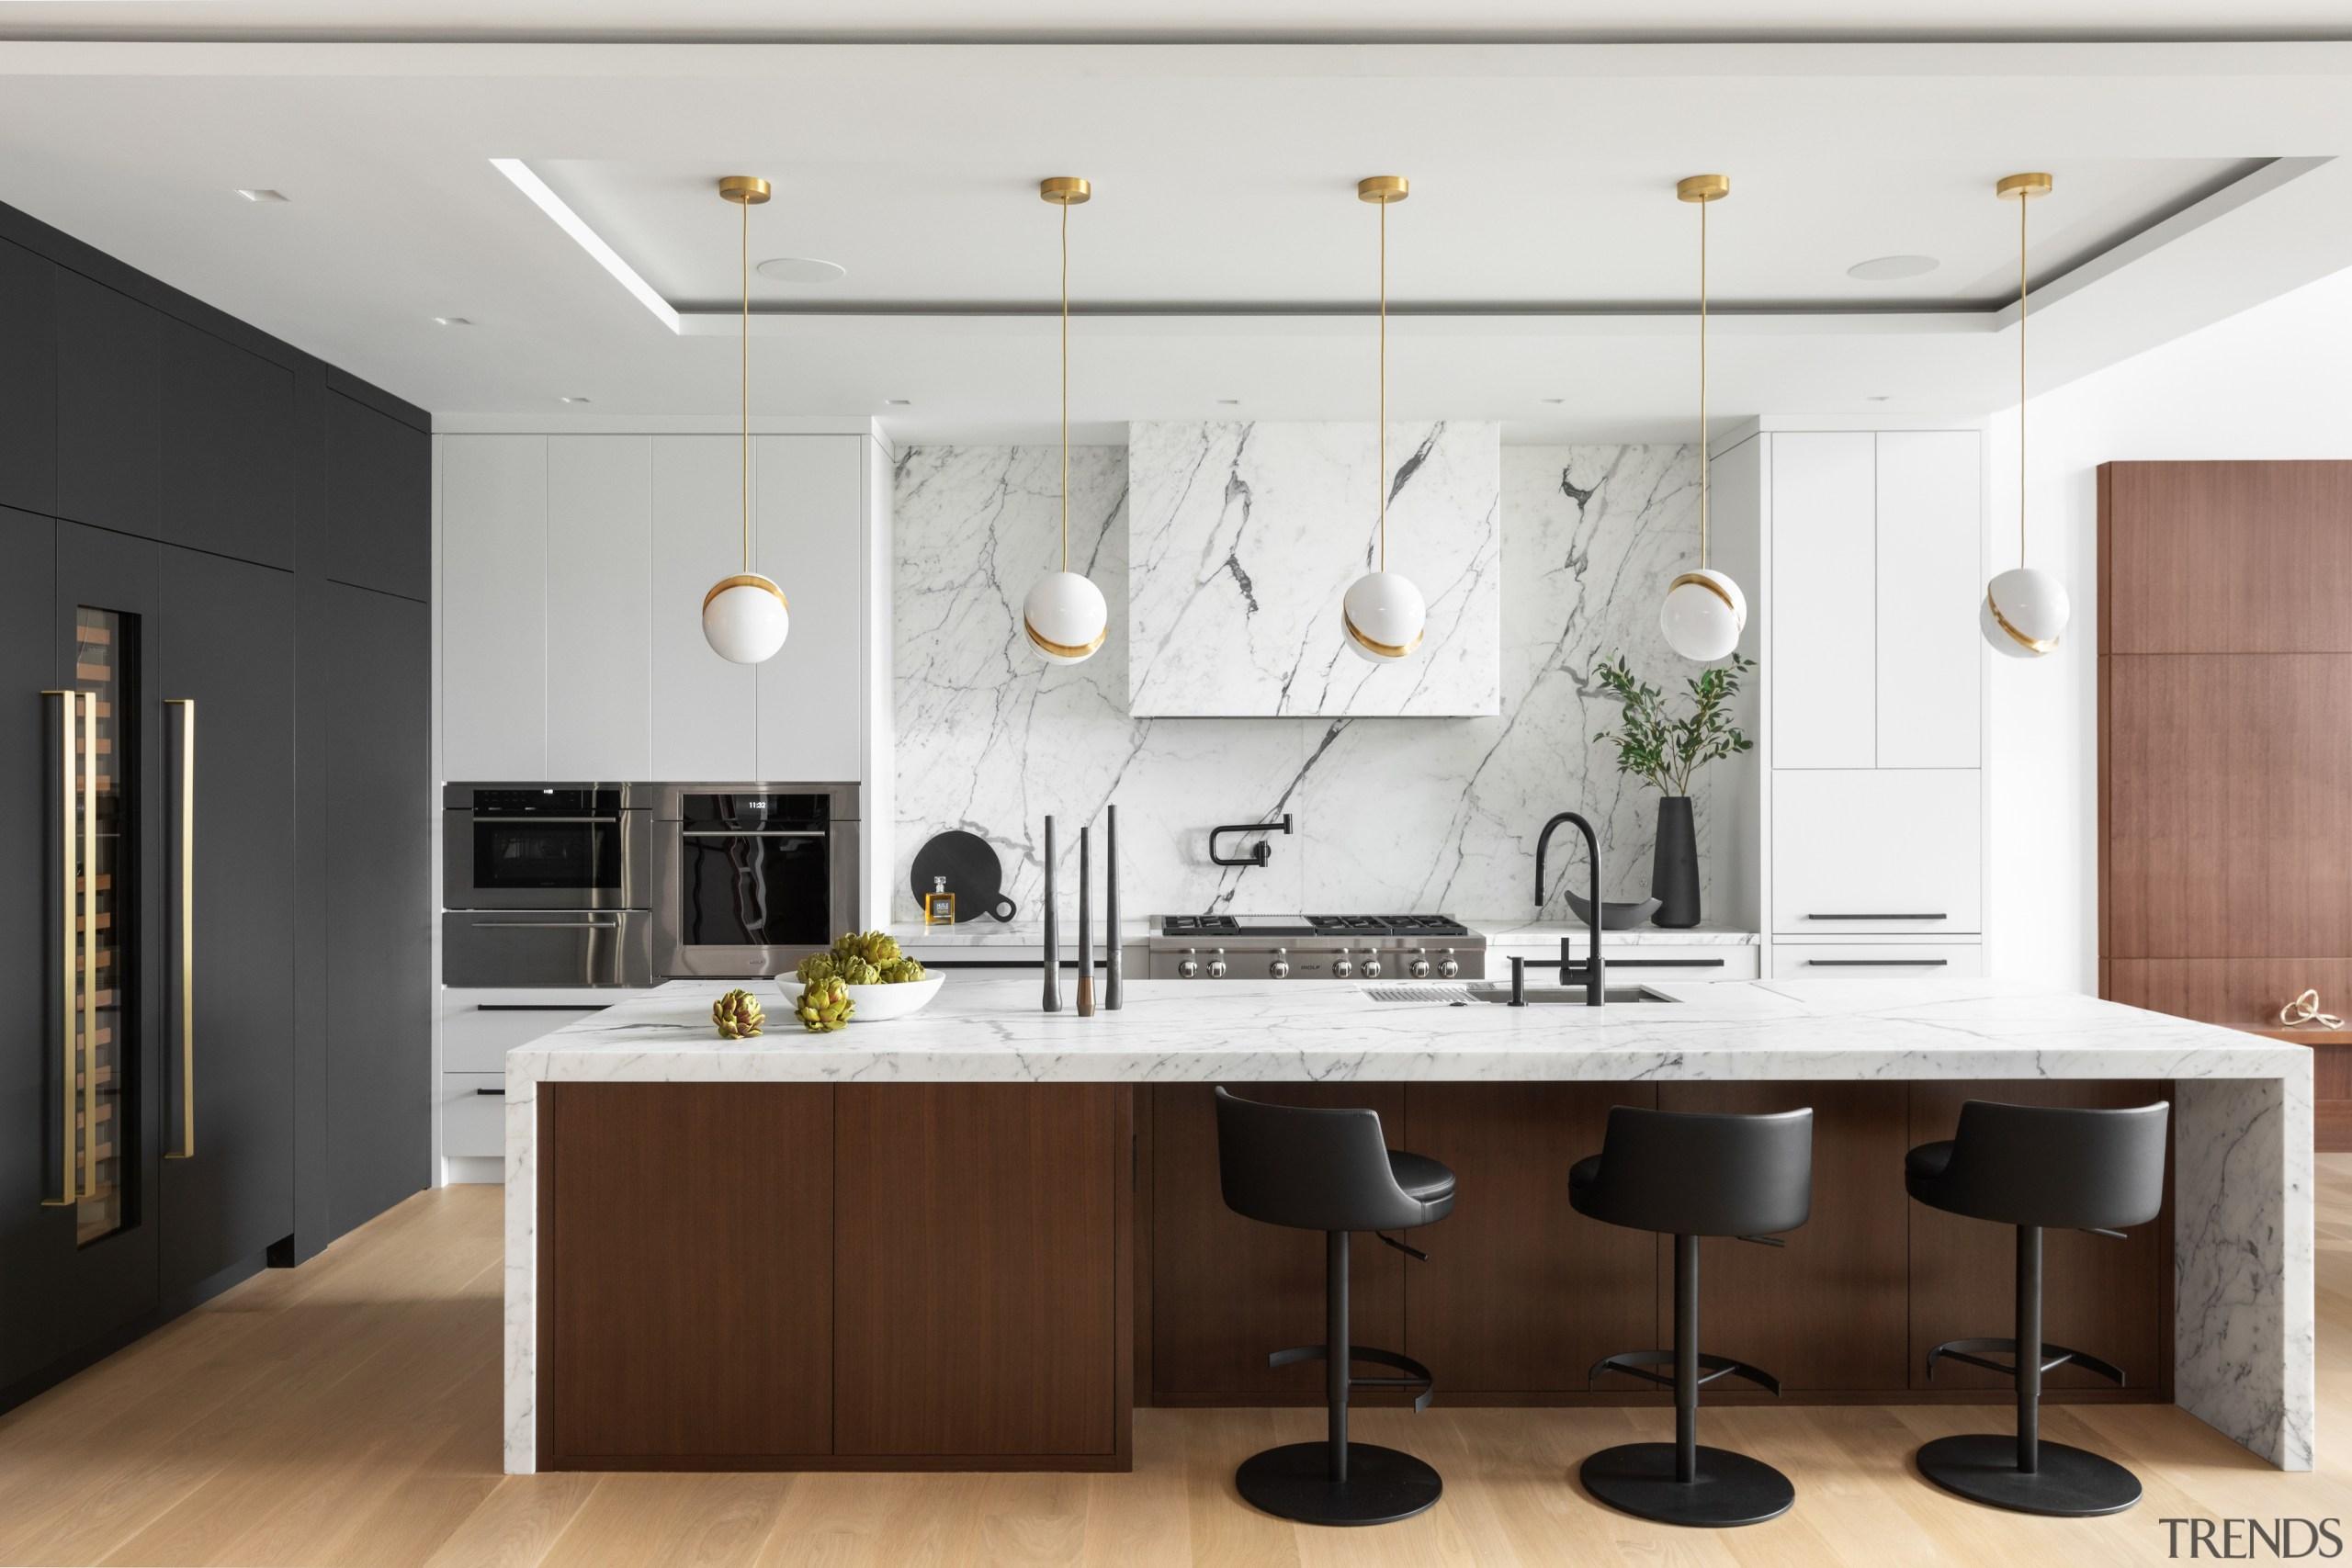 Madeleine Design Group, Vancouver -